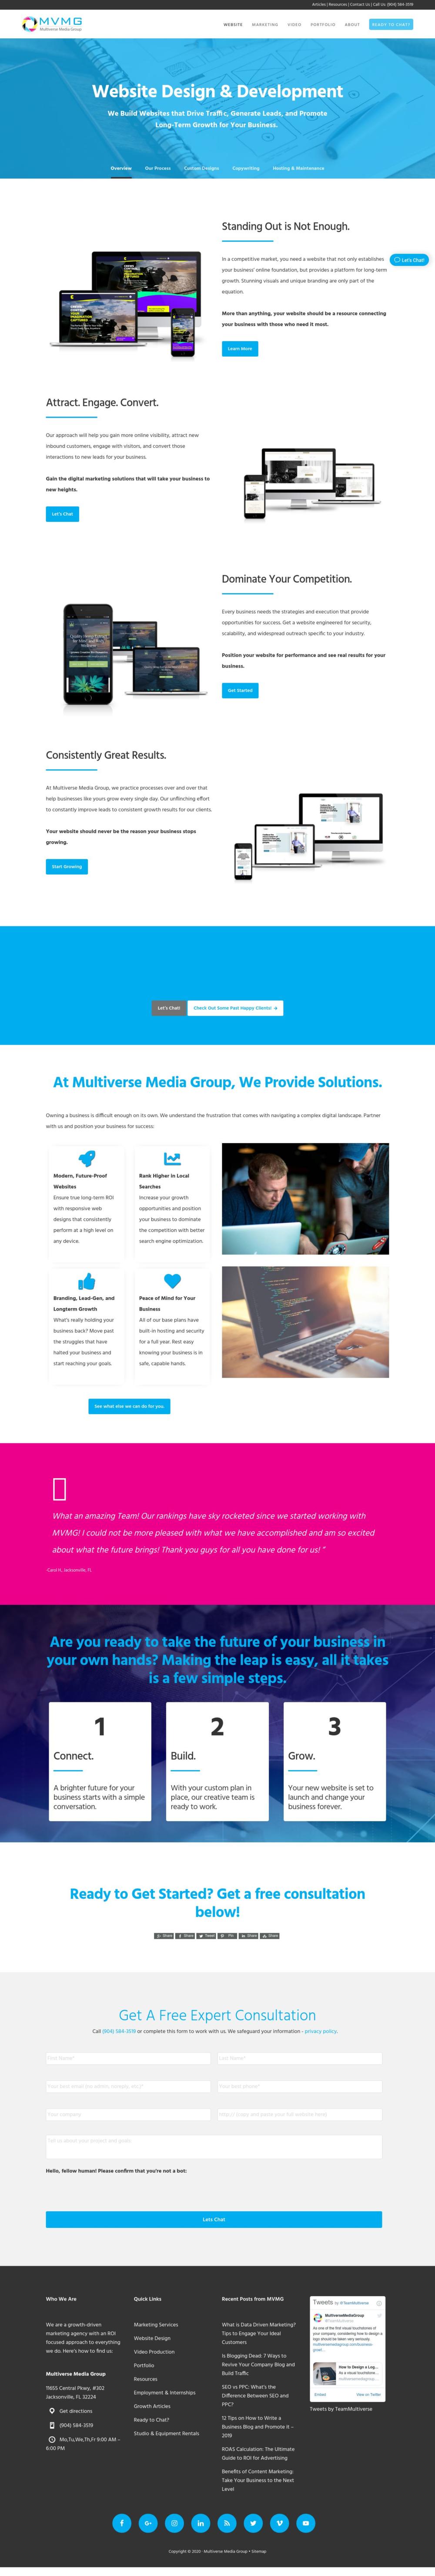 MVMG Marketing Writer full page.